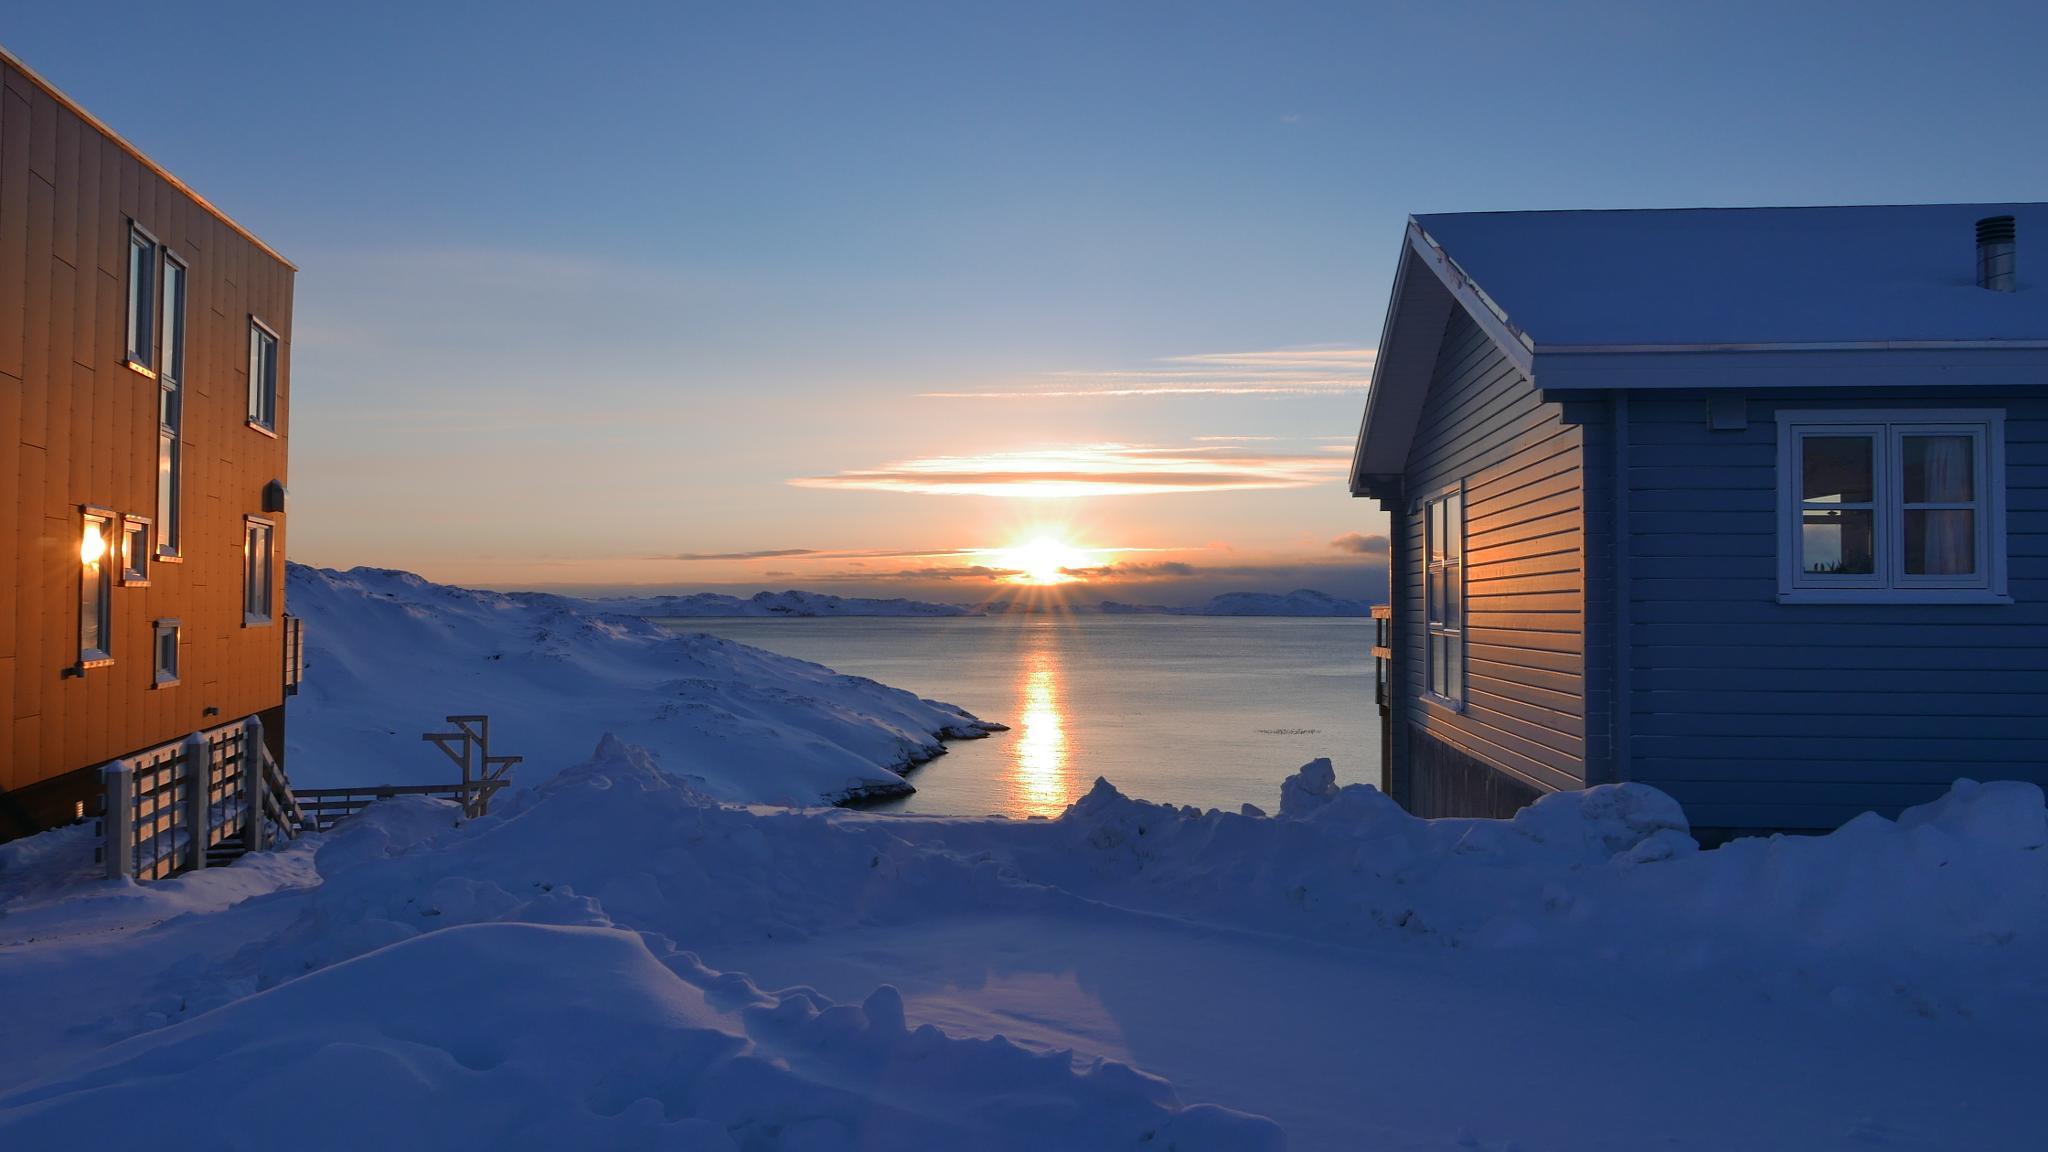 my whew a cold sunny day by Tom Augo Lynge